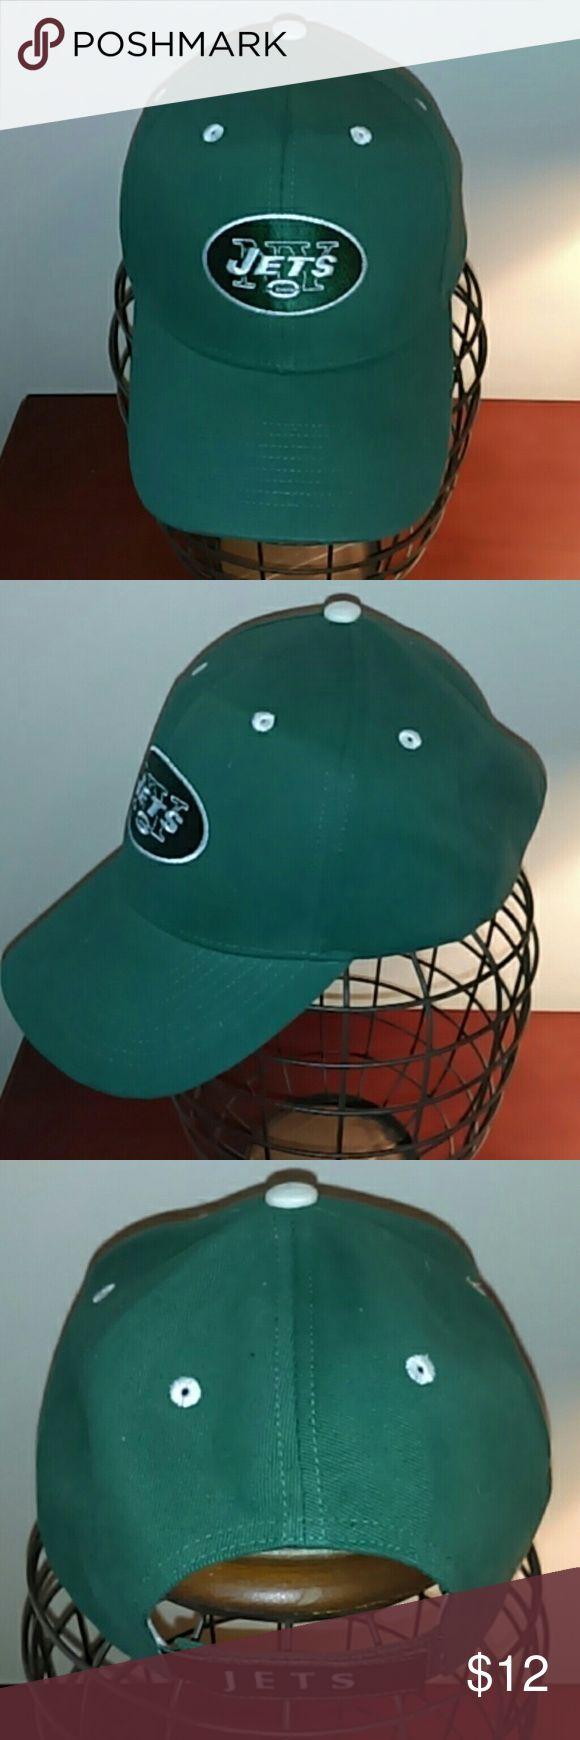 New York Jets Men's adjustable hat NFL apparel New York Jets Men's adjustable hat NFL apparel NFL Accessories Hats